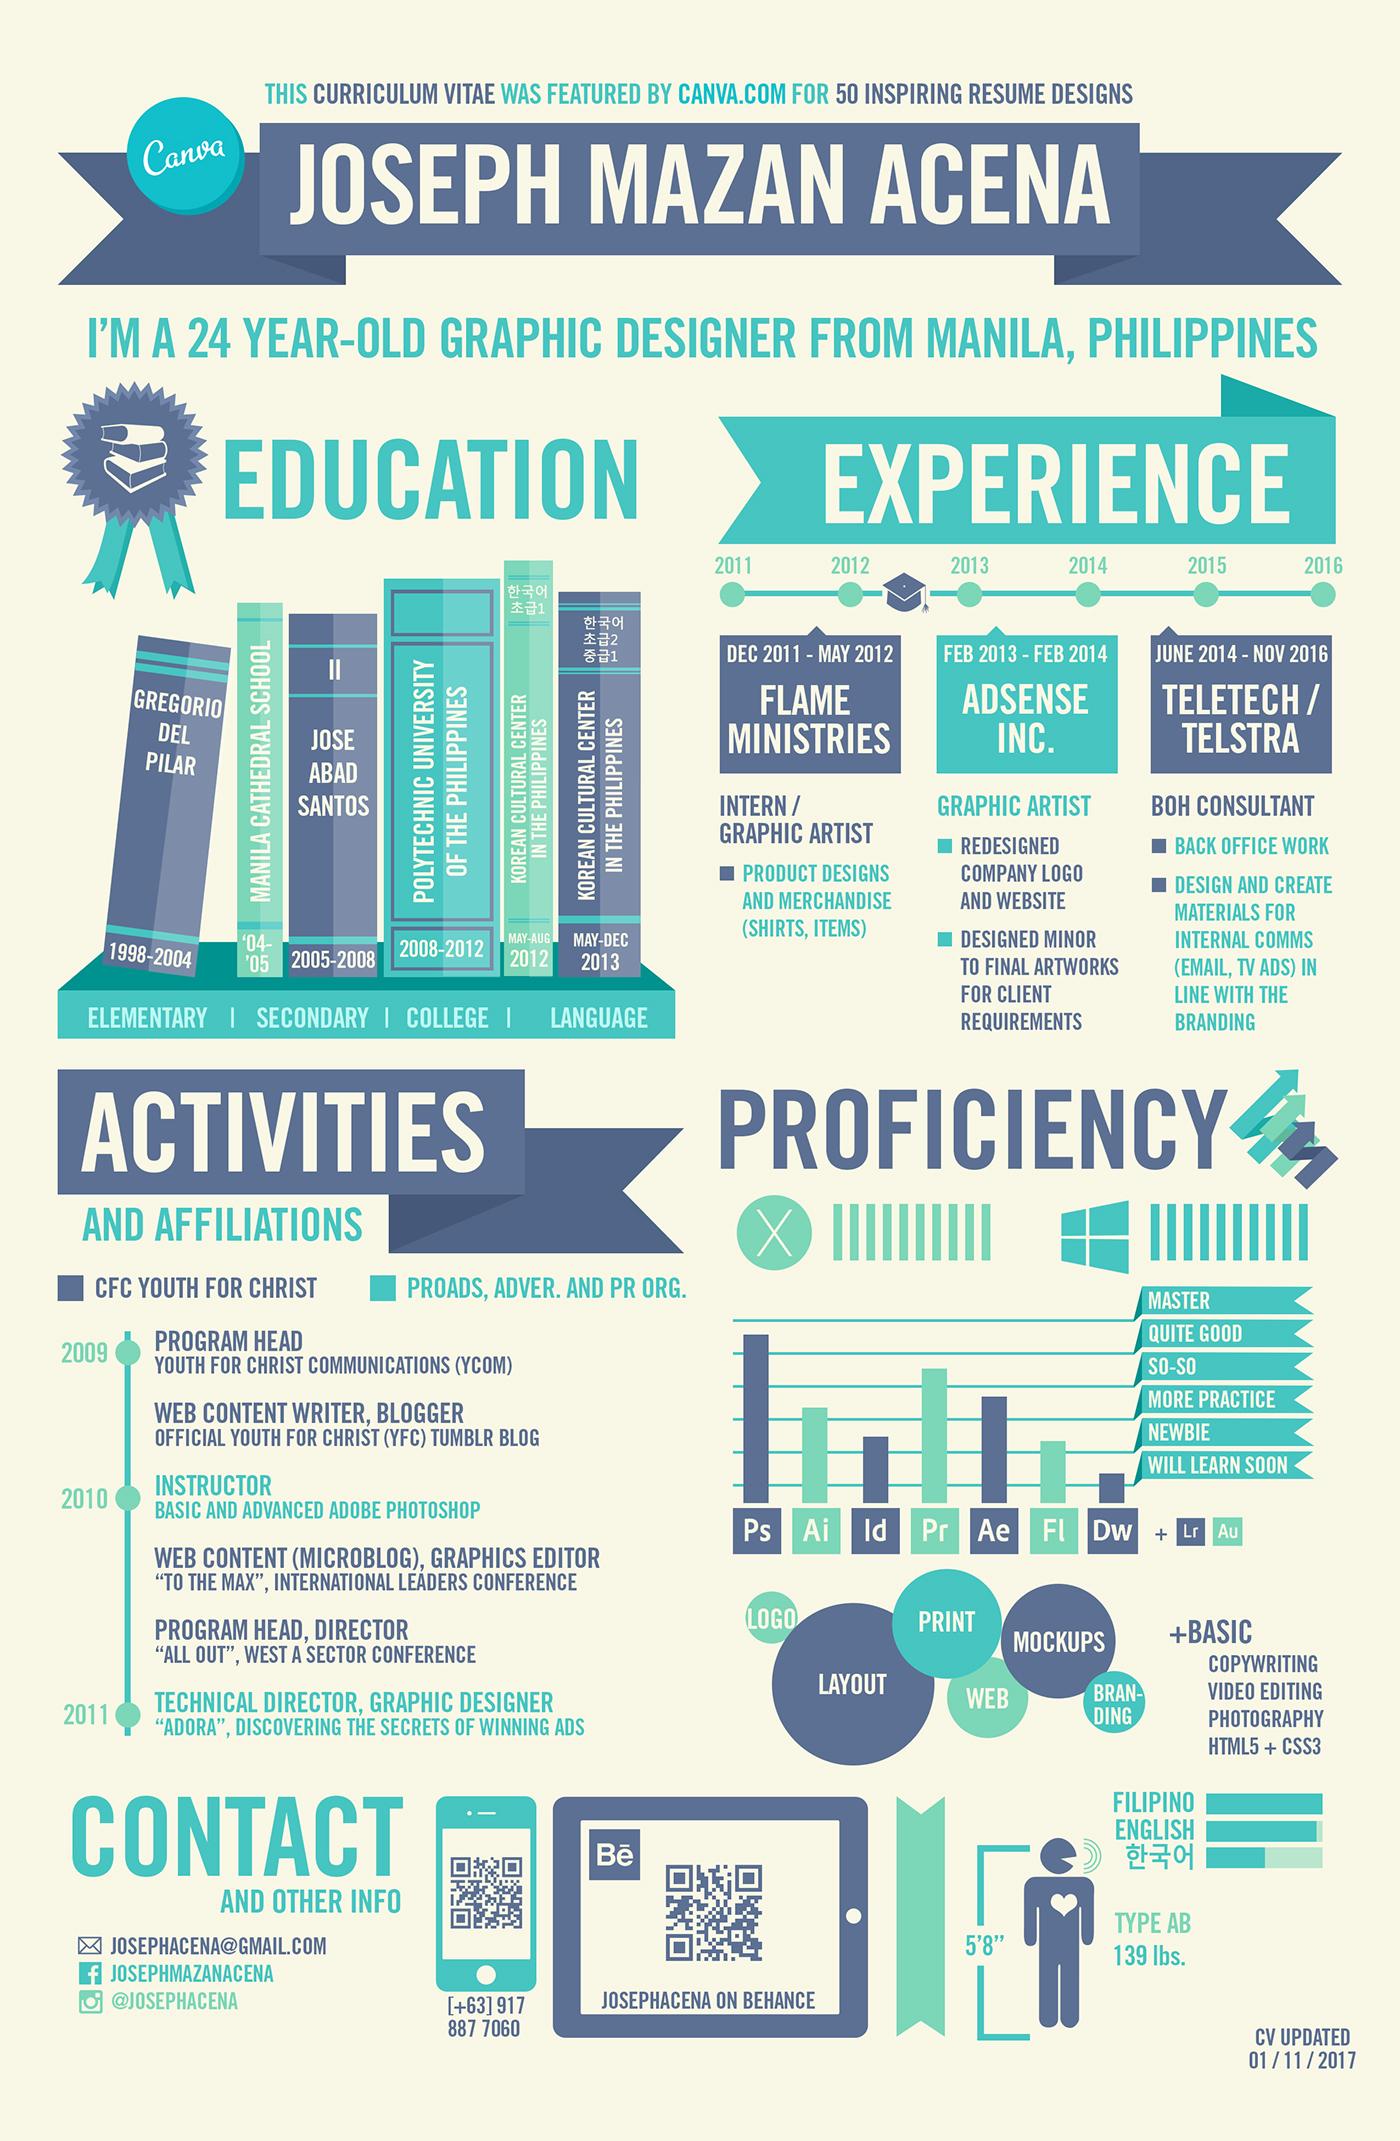 creative CV Creative Resume josephacena joseph mazan acena creative CV Resume canva cv canva resume